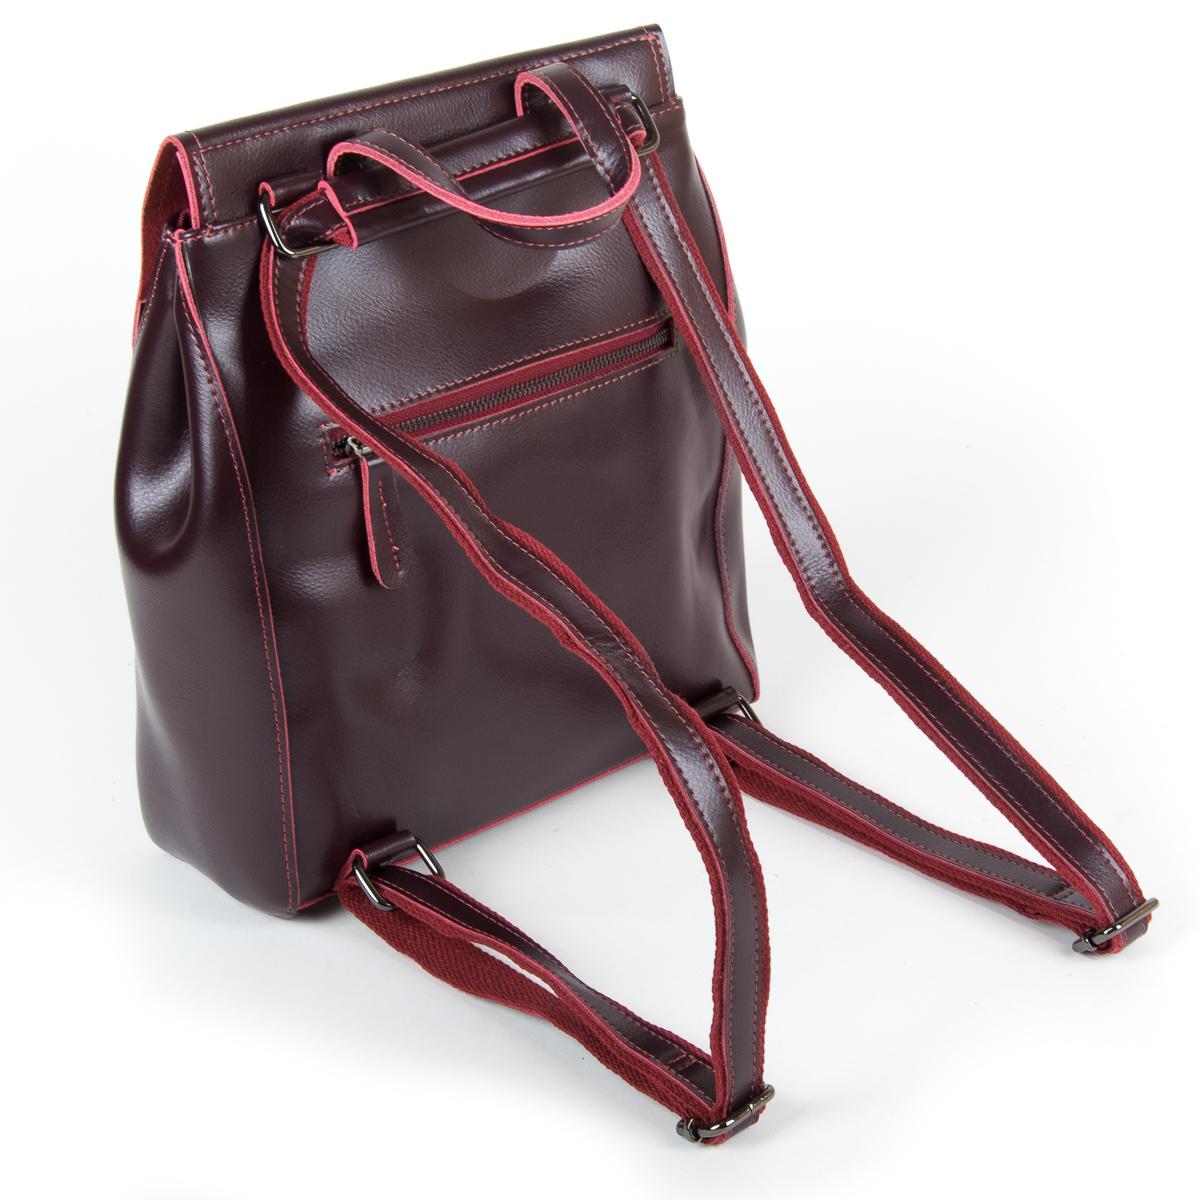 Сумка Женская Рюкзак кожа ALEX RAI 9-01 1005 clared - фото 4